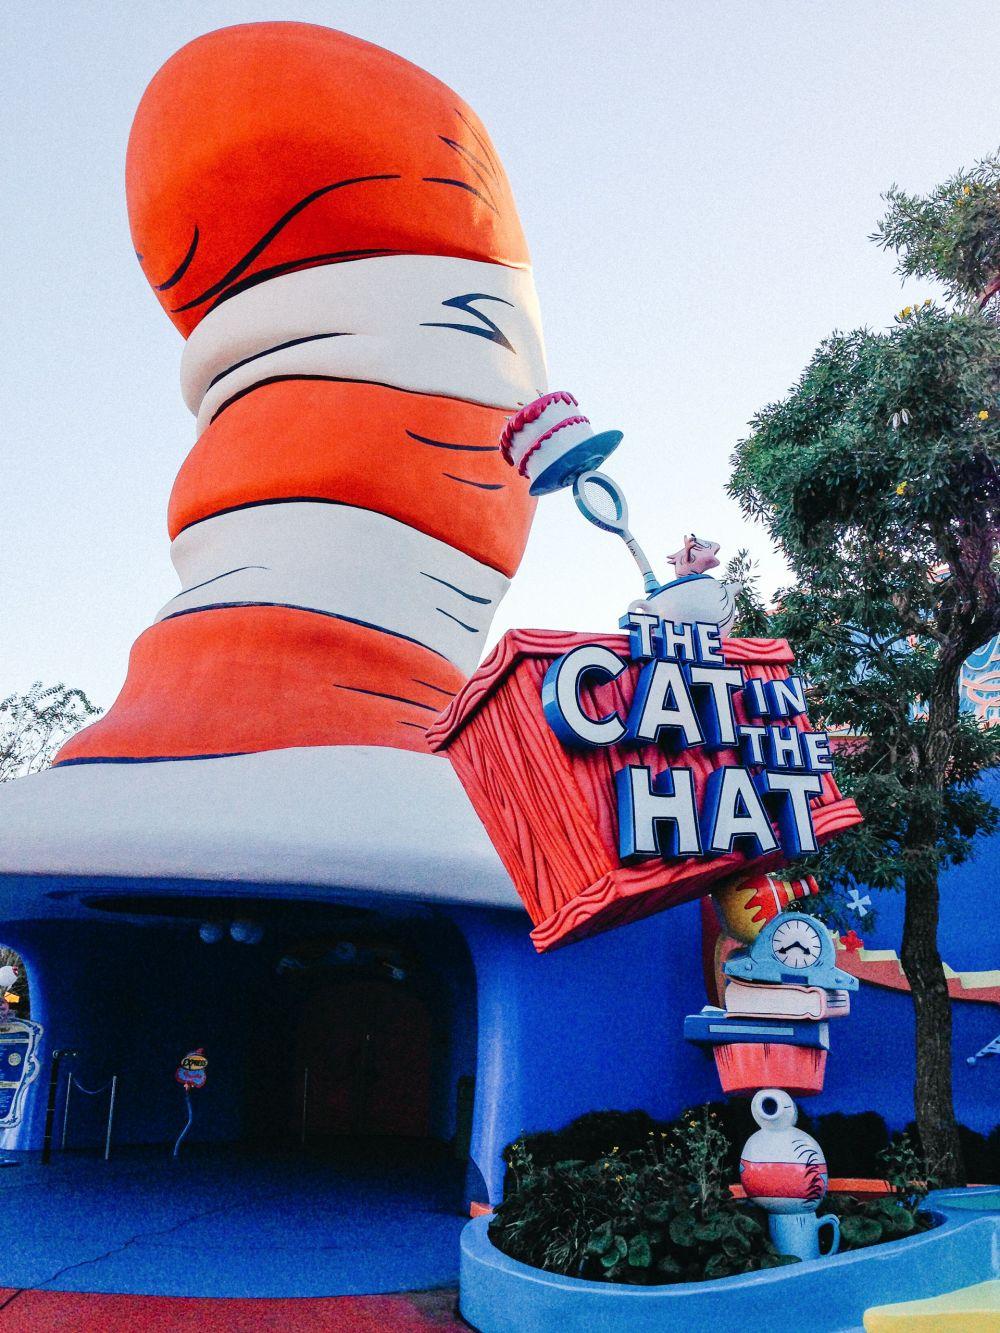 Universal Studios and Islands of Adventure in Orlando, Florida, USA (8)